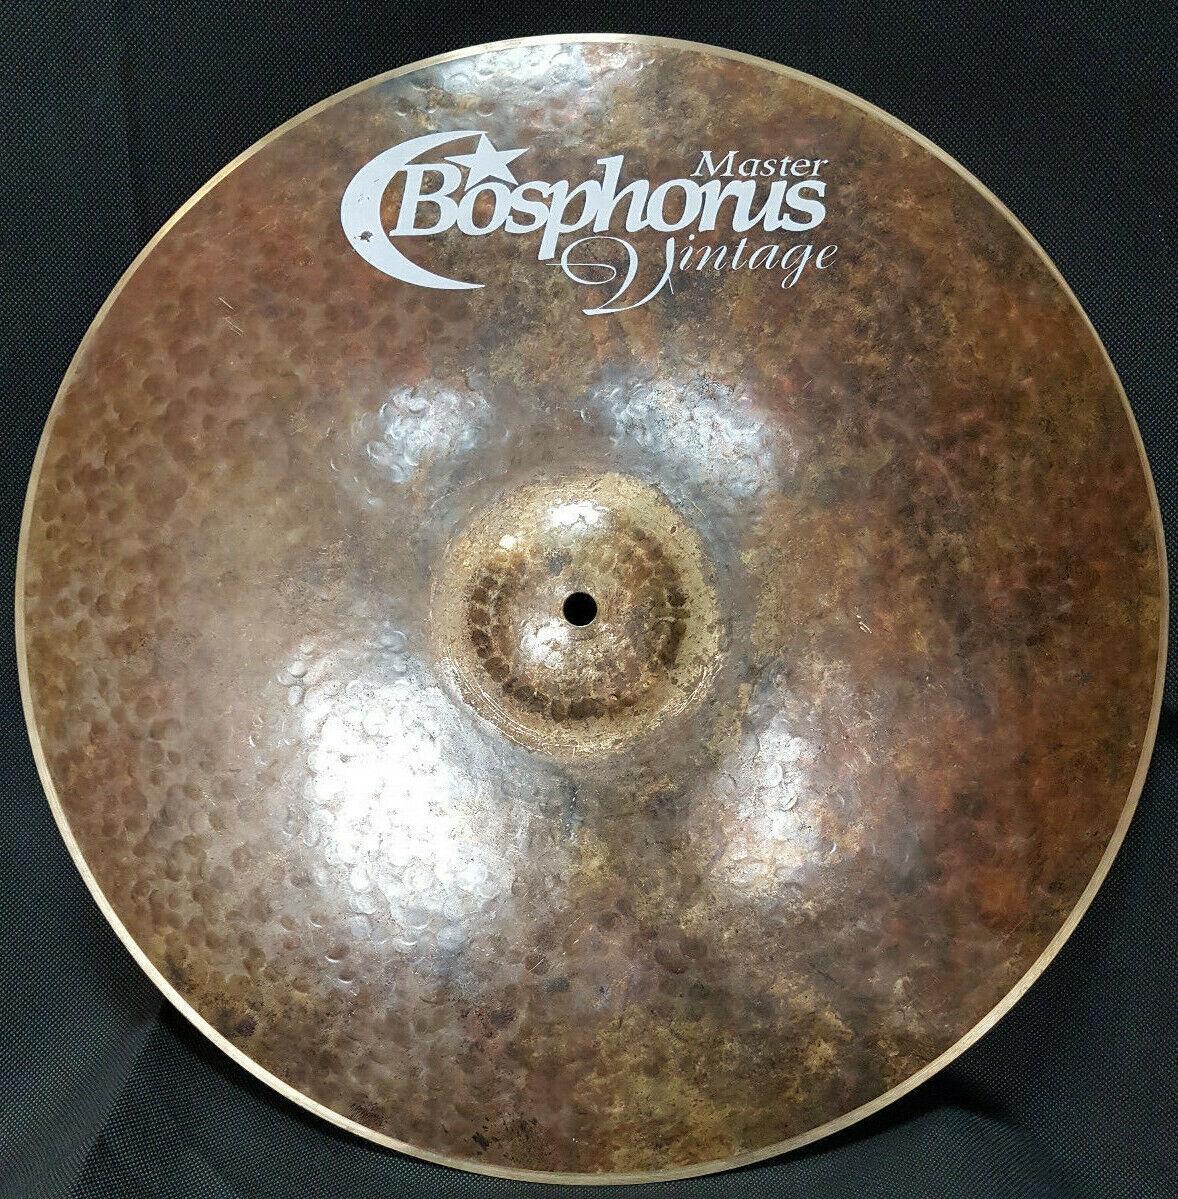 Bosphorus Master Vintage 16  Crash Ride Becken 874g Piatto Cymbal Messe 2019